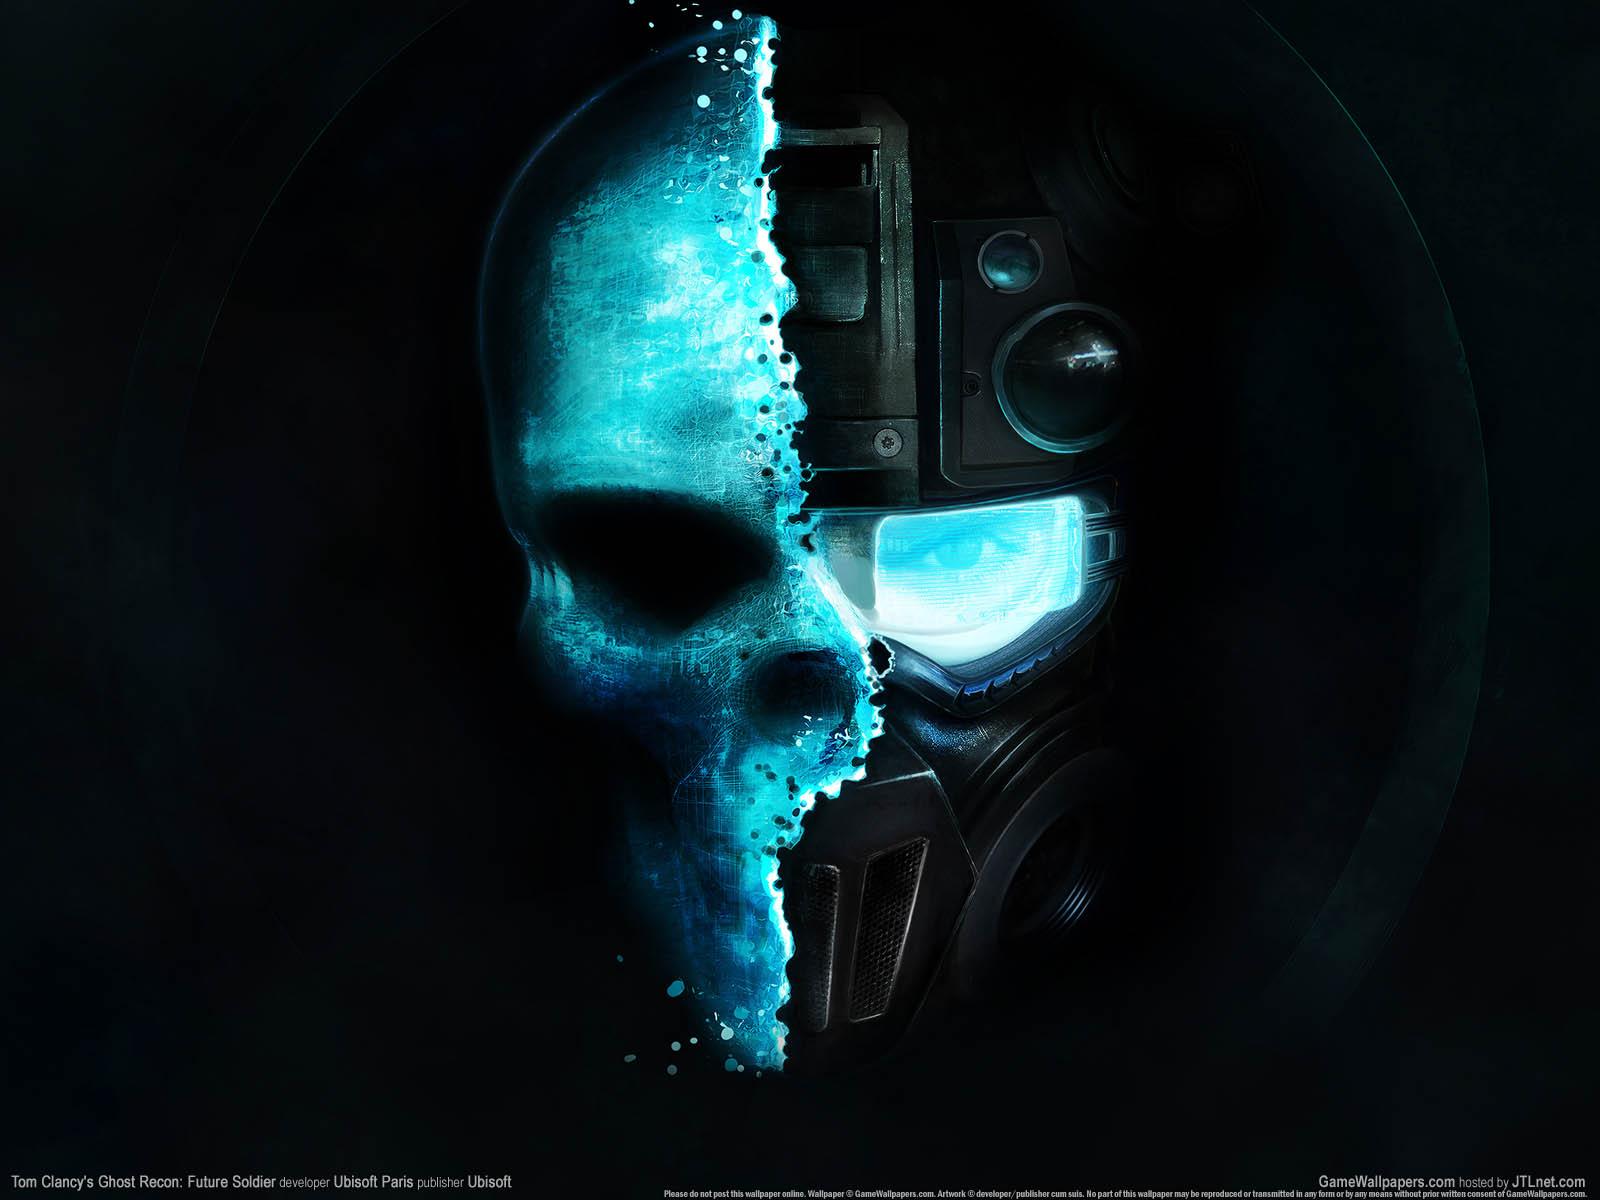 Tom Clancy's Ghost Recon: Future Soldierνmmer=01 achtergrond  1600x1200